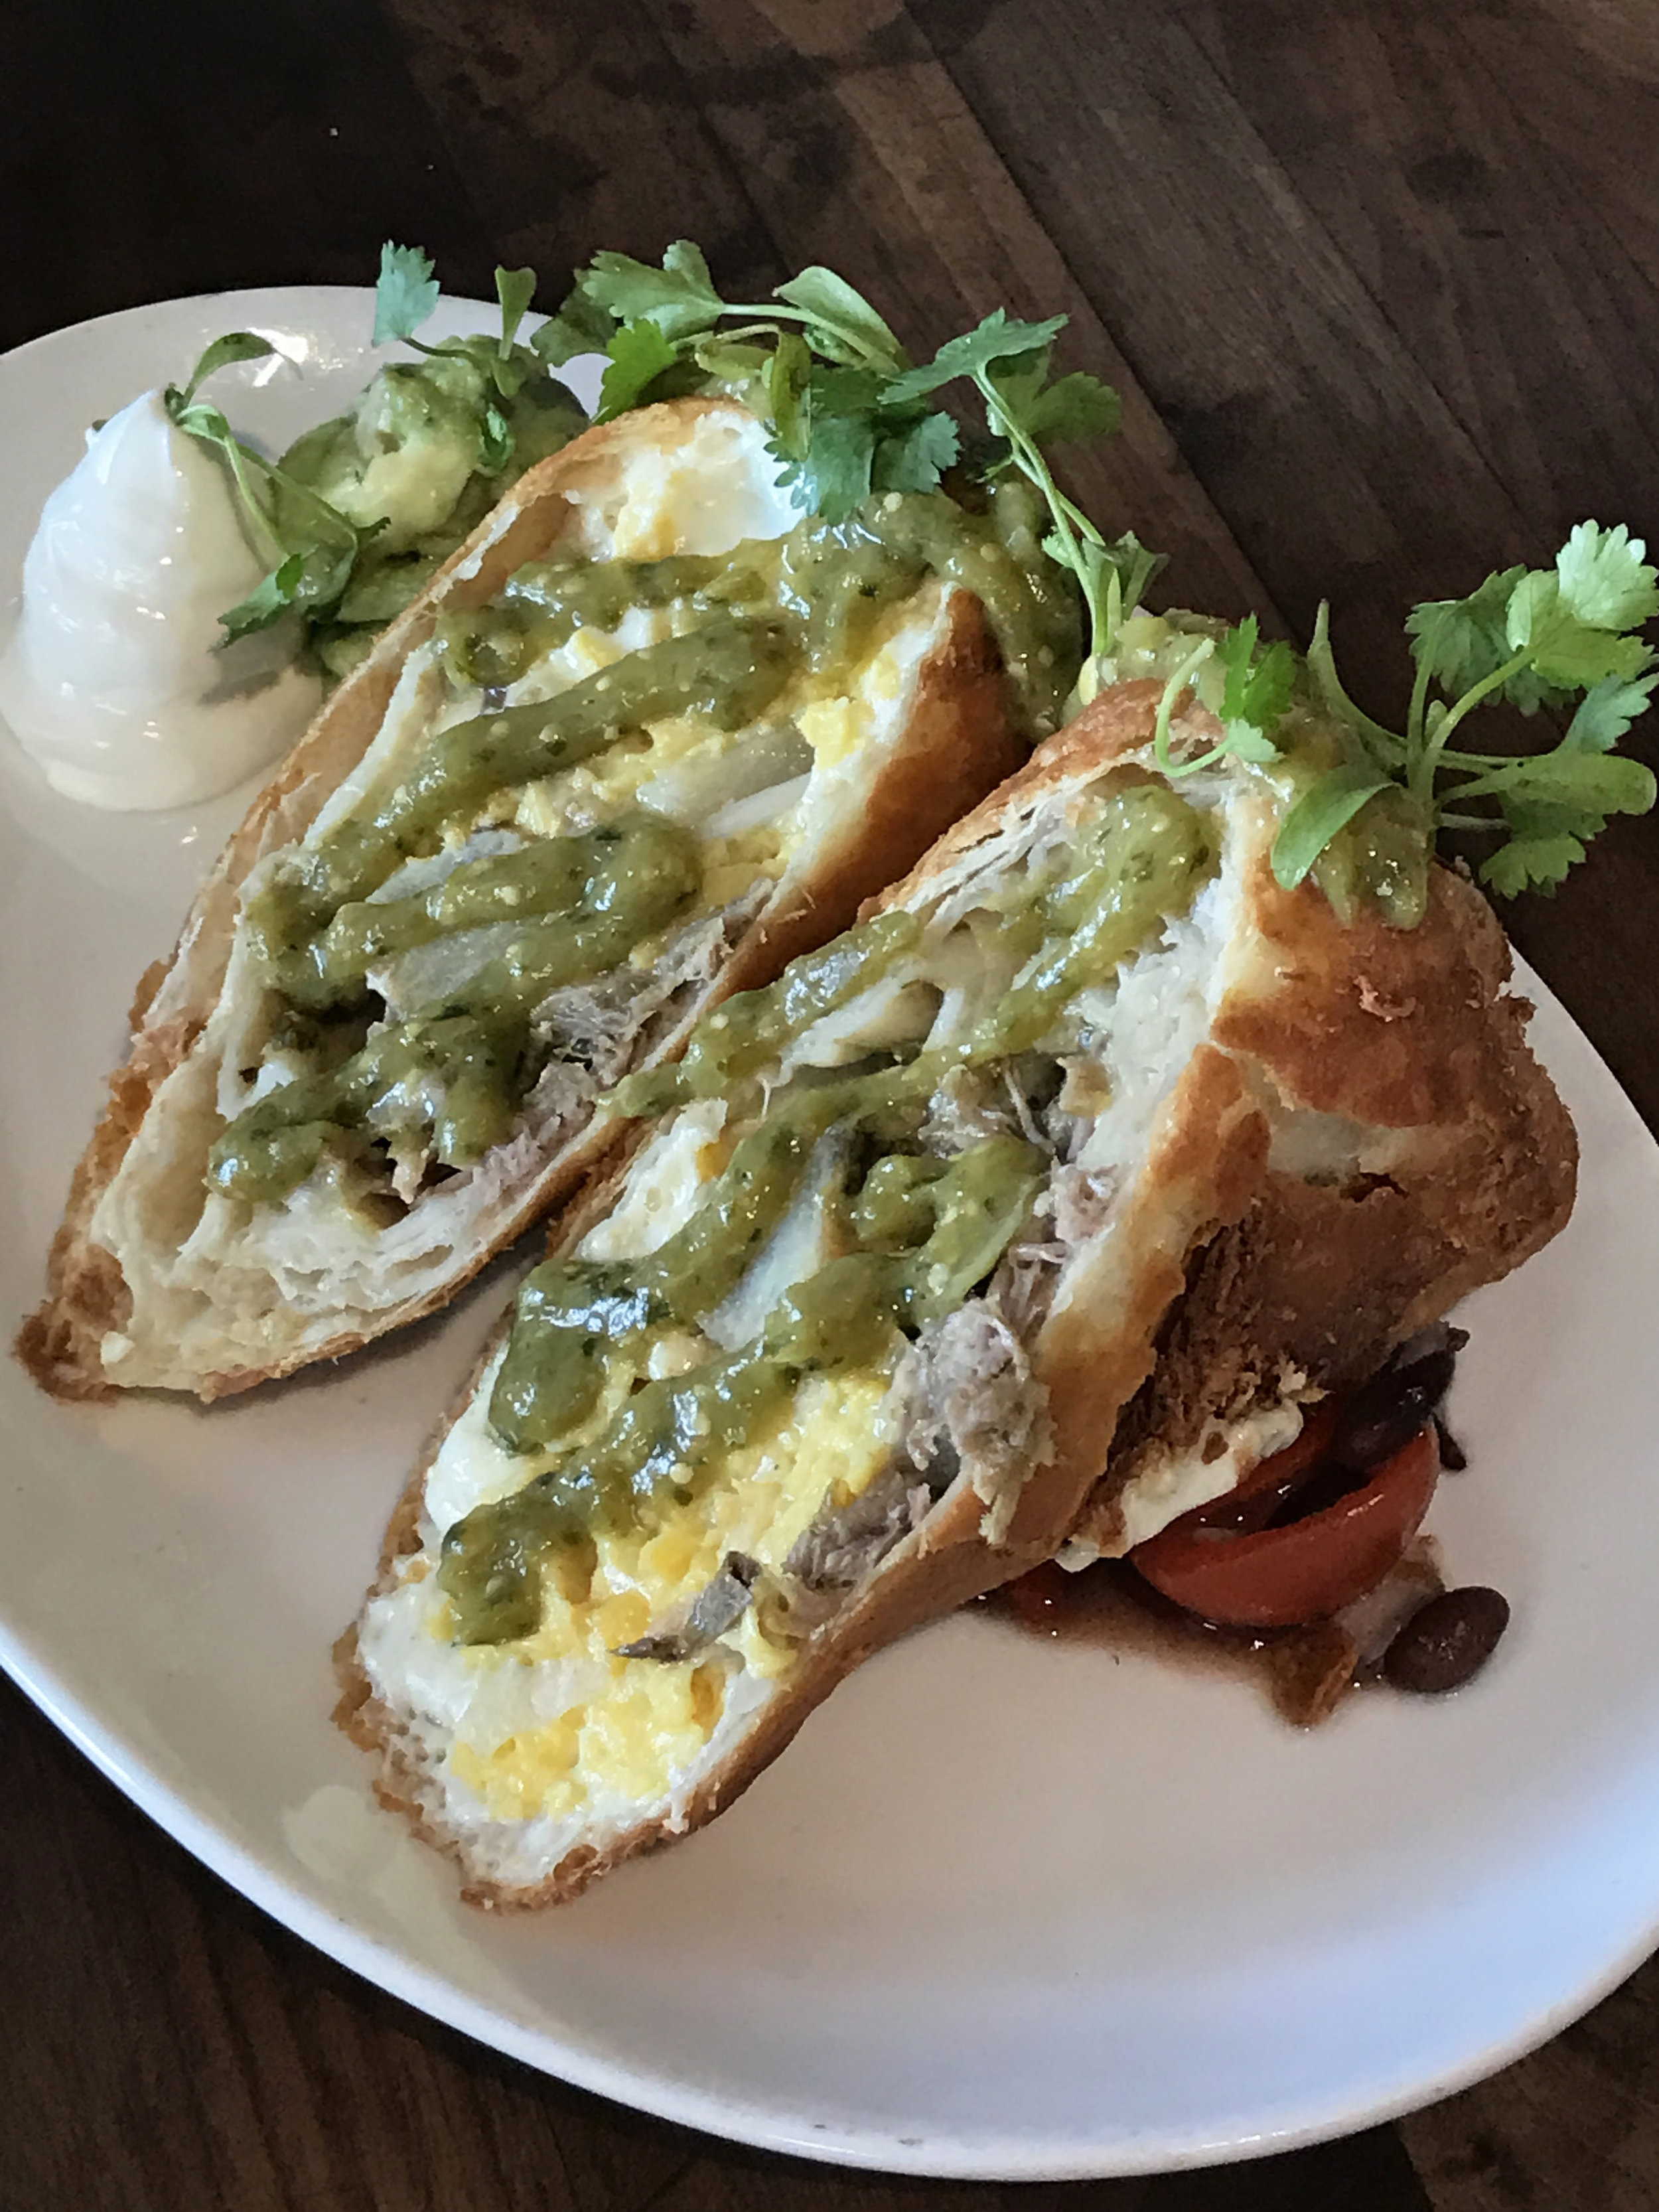 Chimichanga with scrambled egg, salsa verde pork, and pepperjack